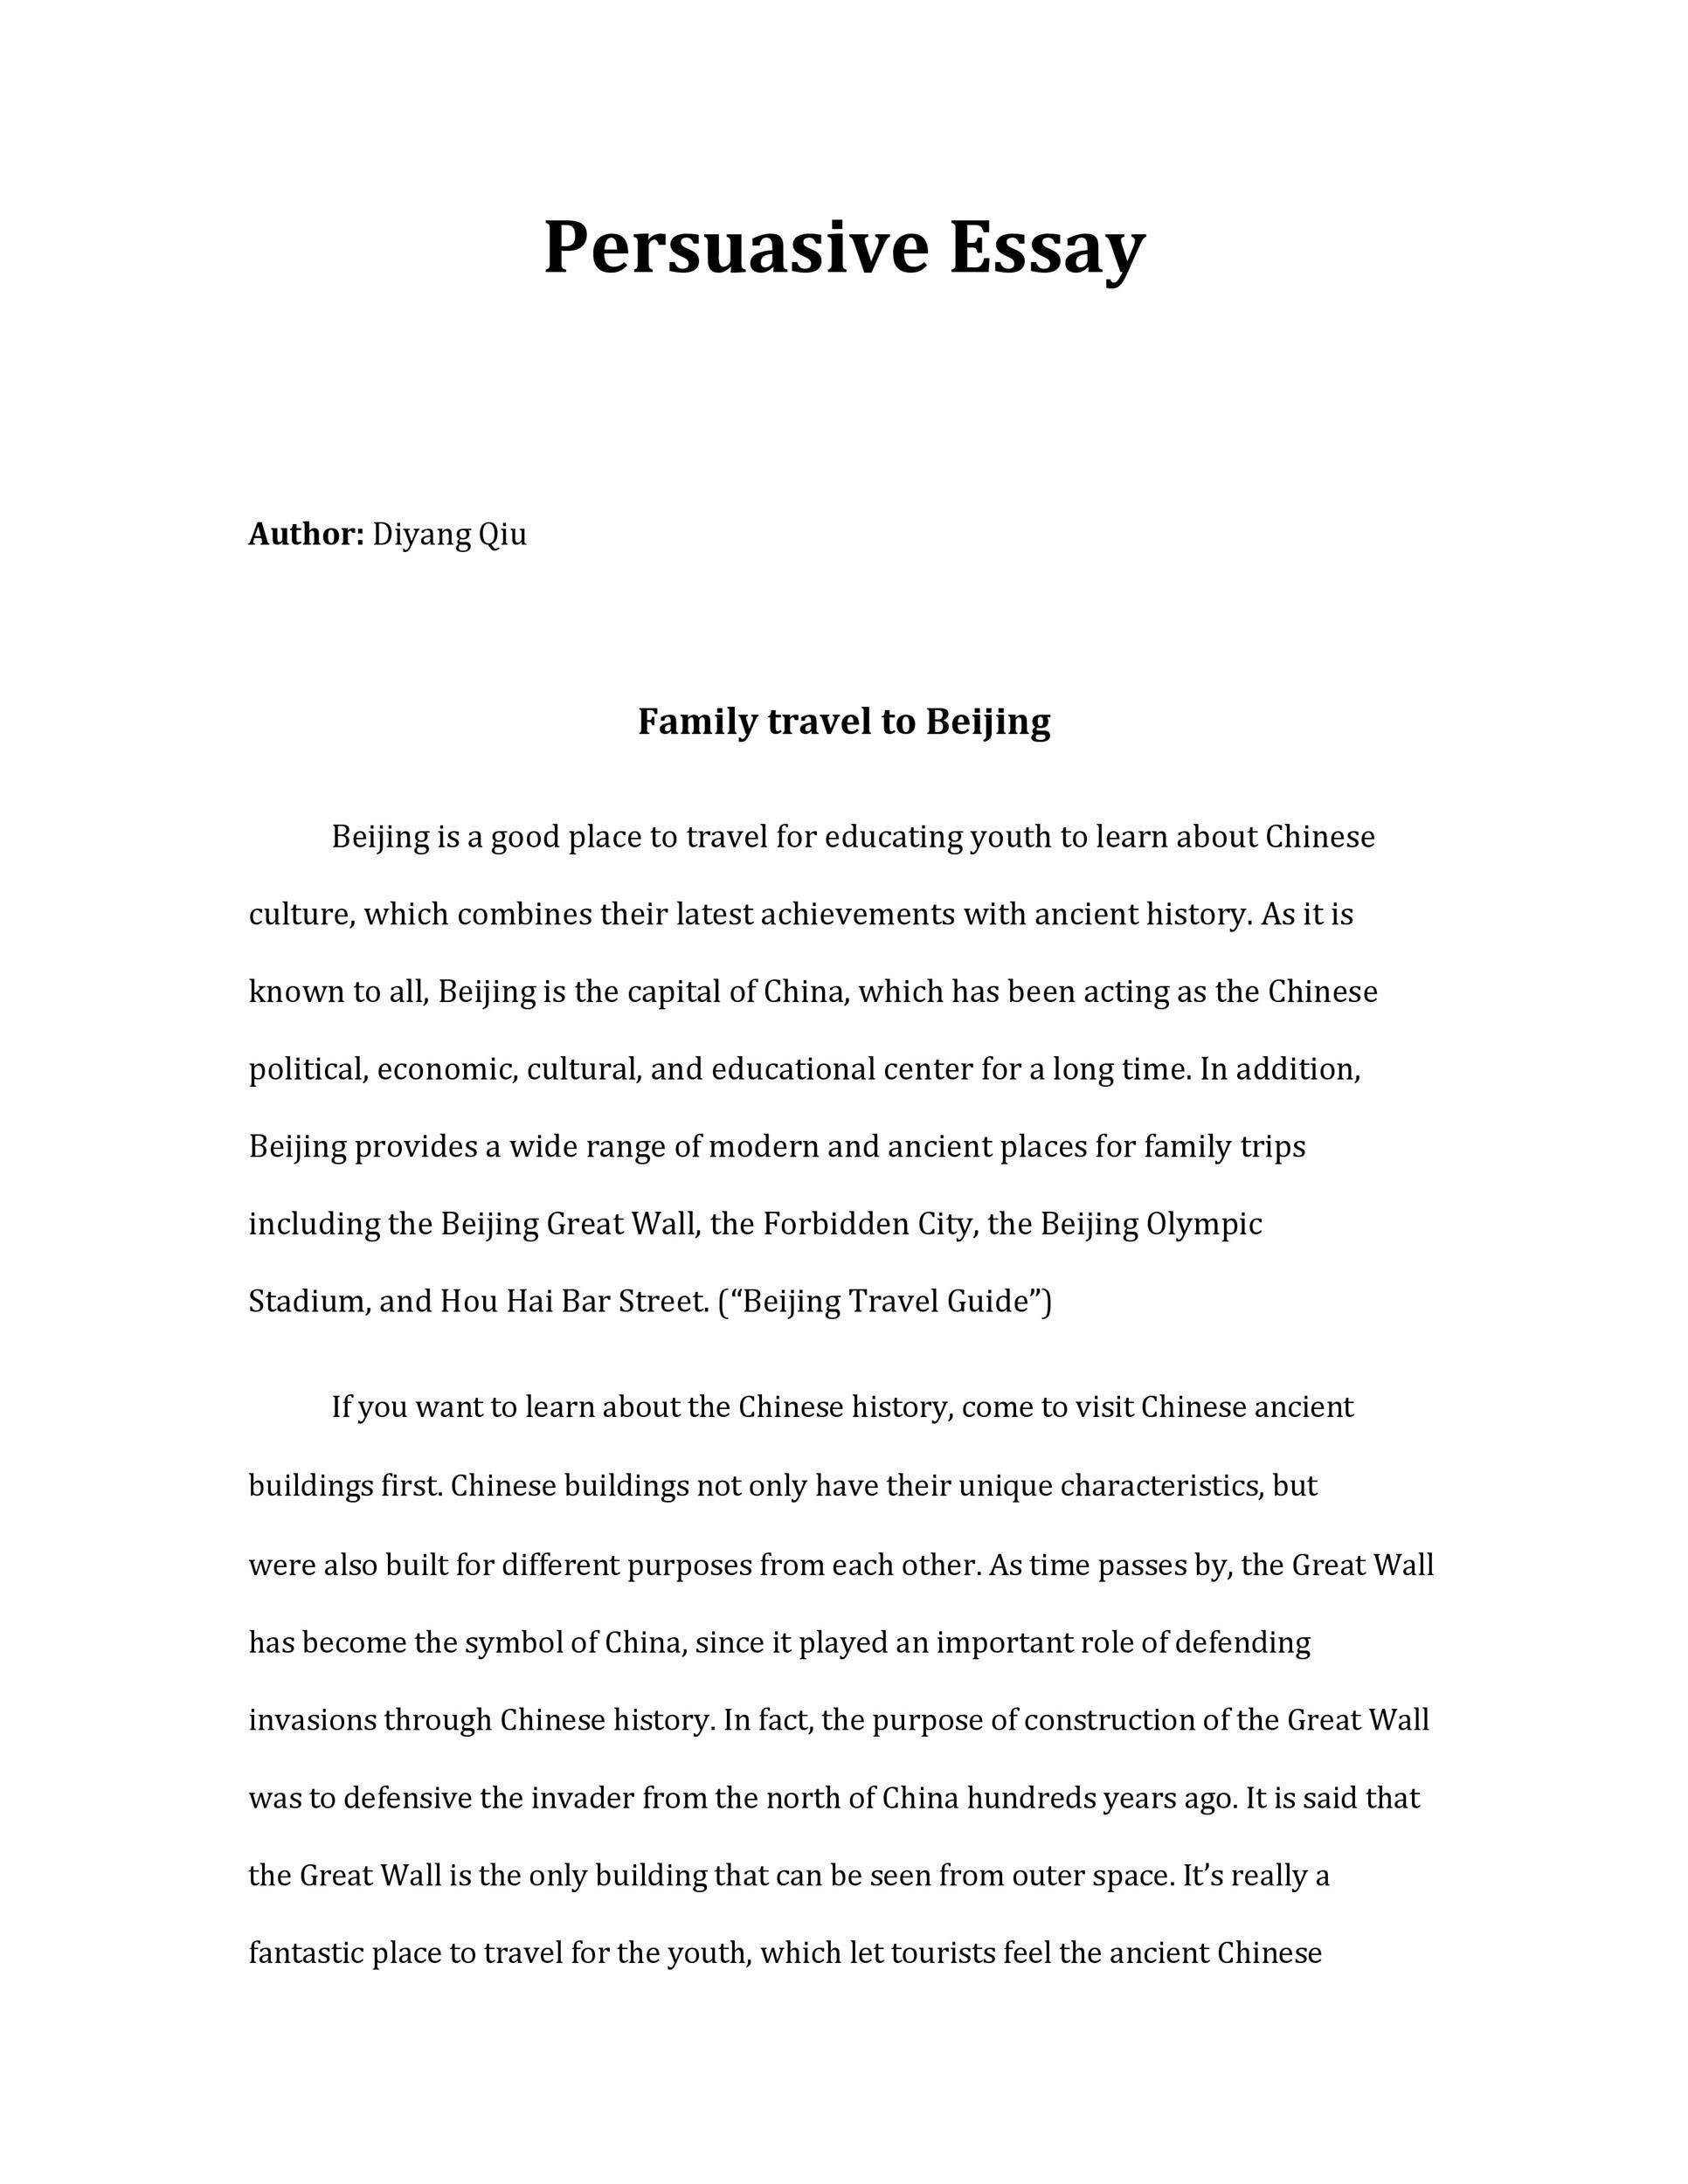 50 Free Persuasive Essay Examples Best Topics Templatelab